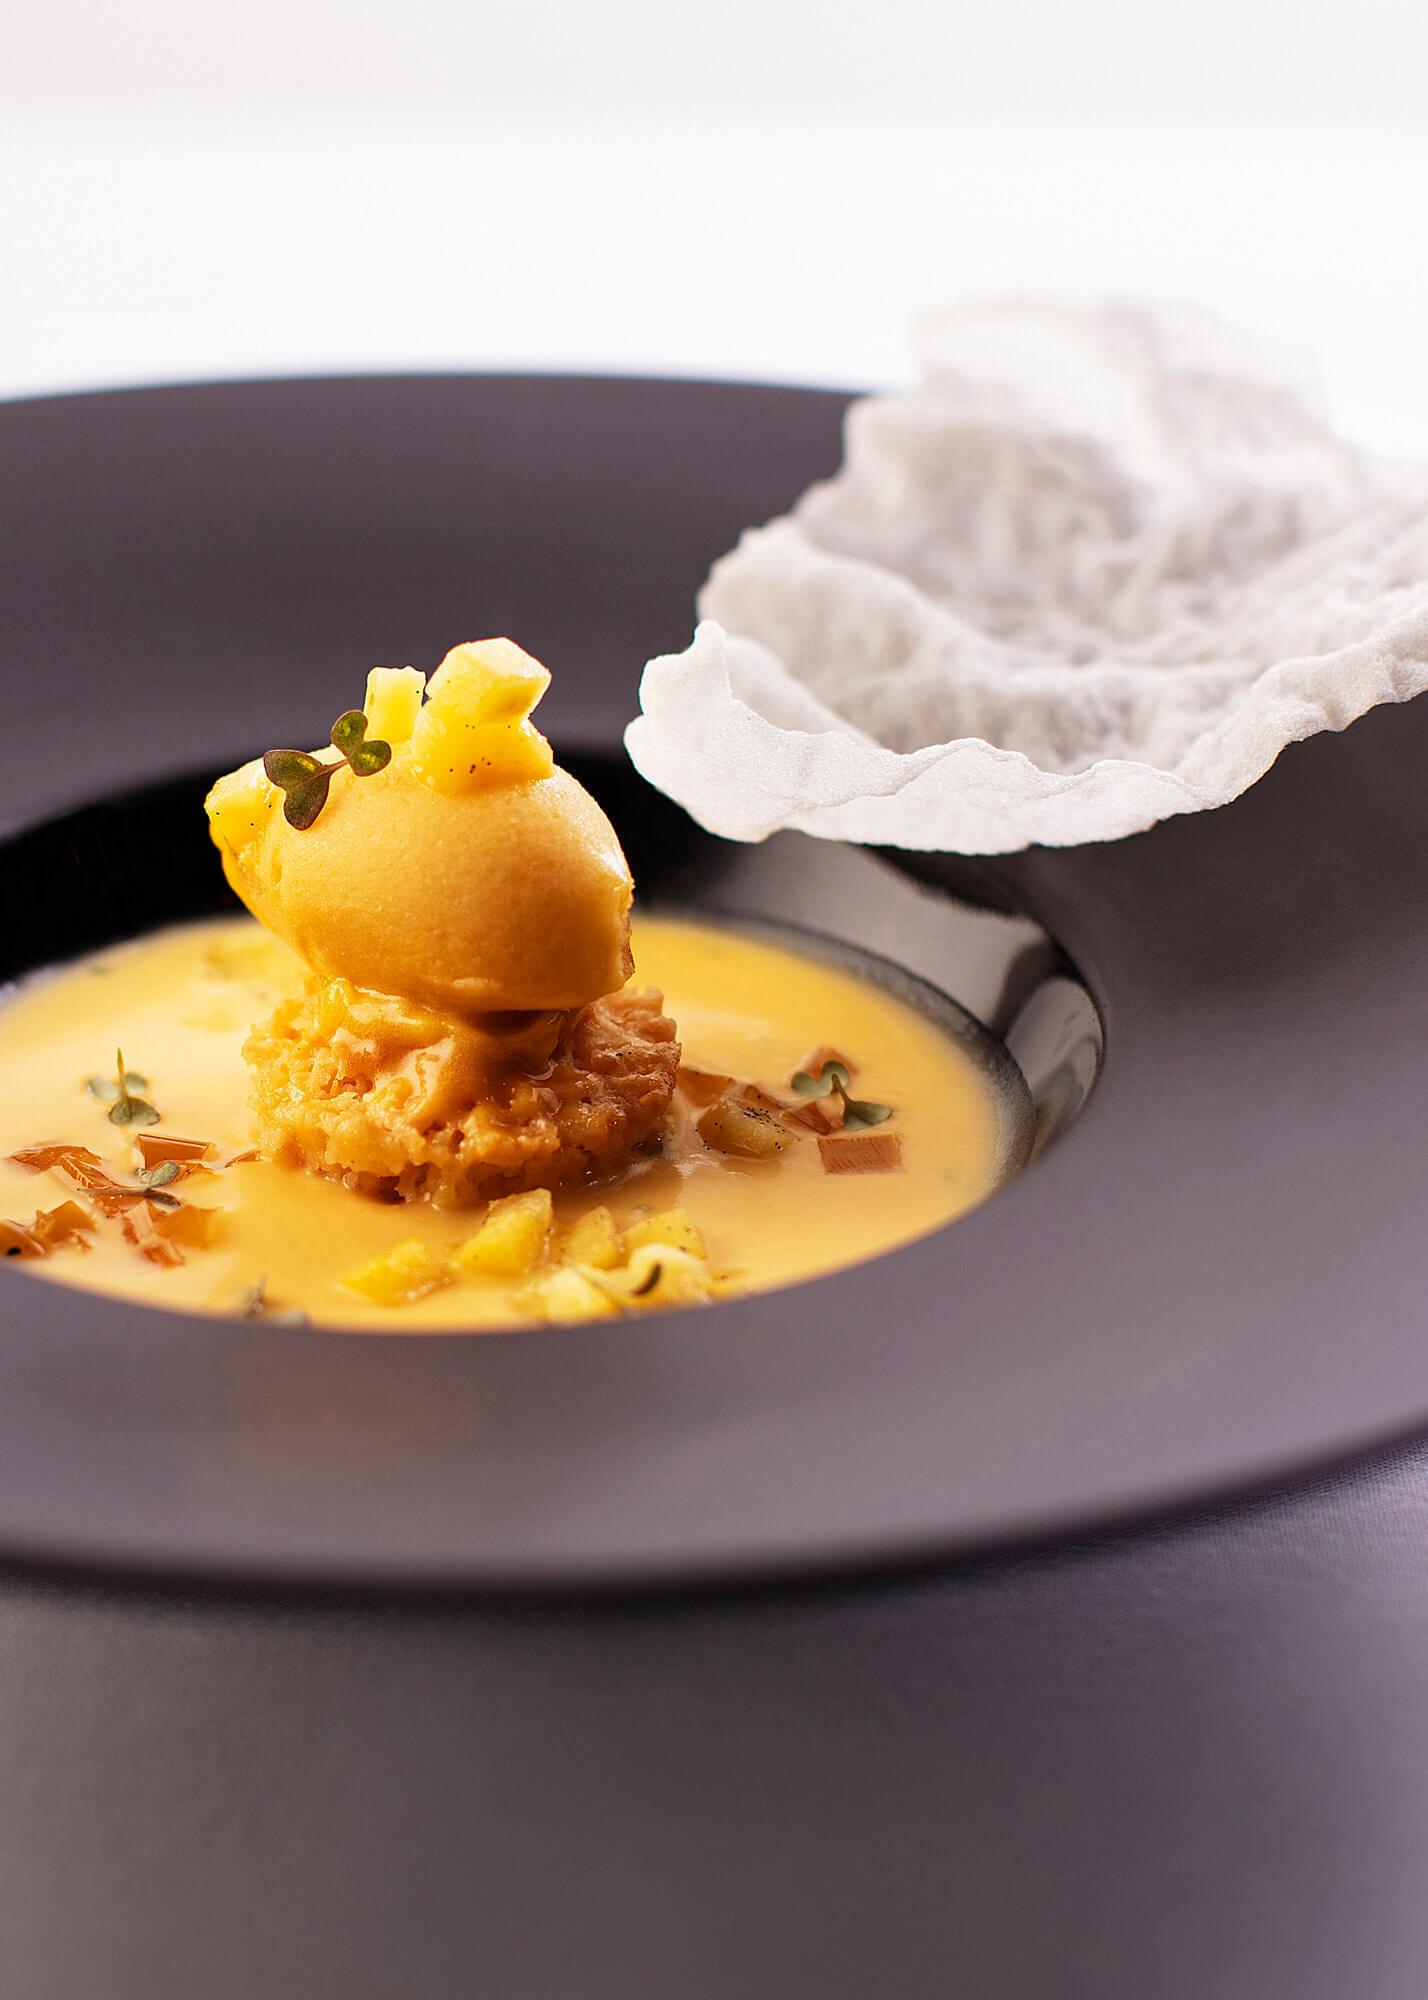 Fine dining soup